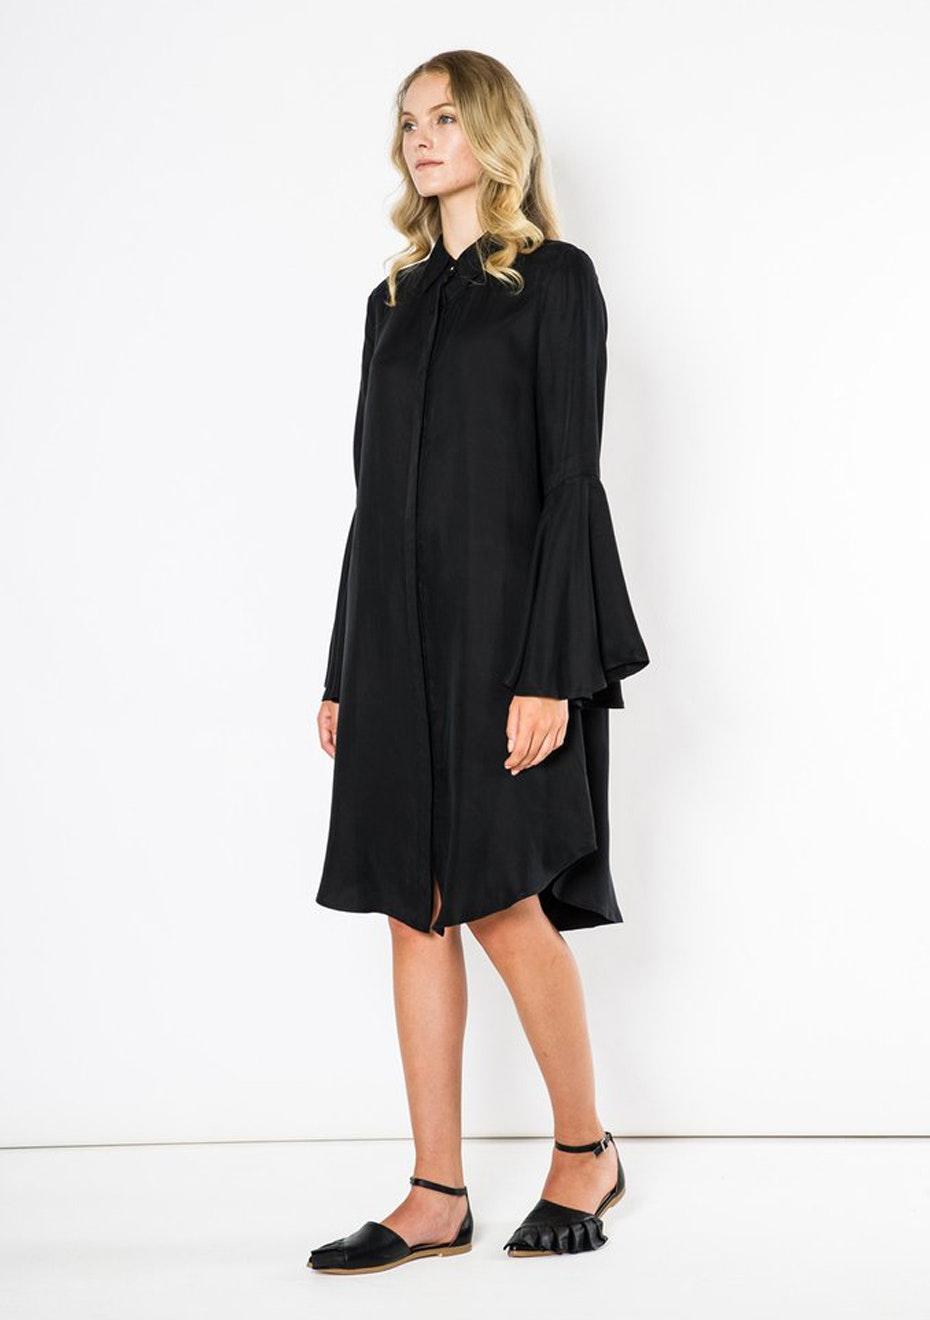 Julian Danger - Bobbie Bell Dress - Black